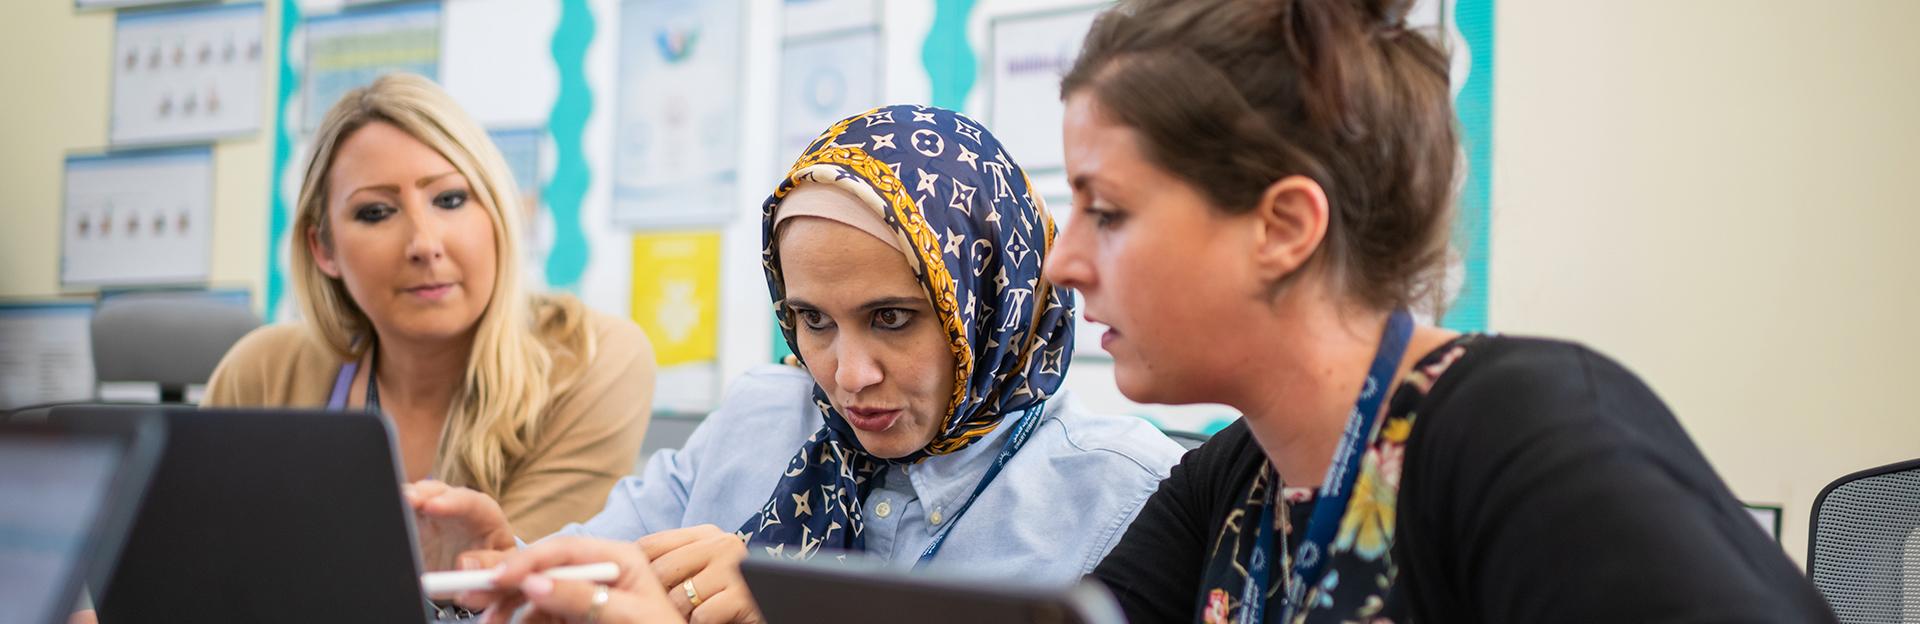 Smart Vision School - Team